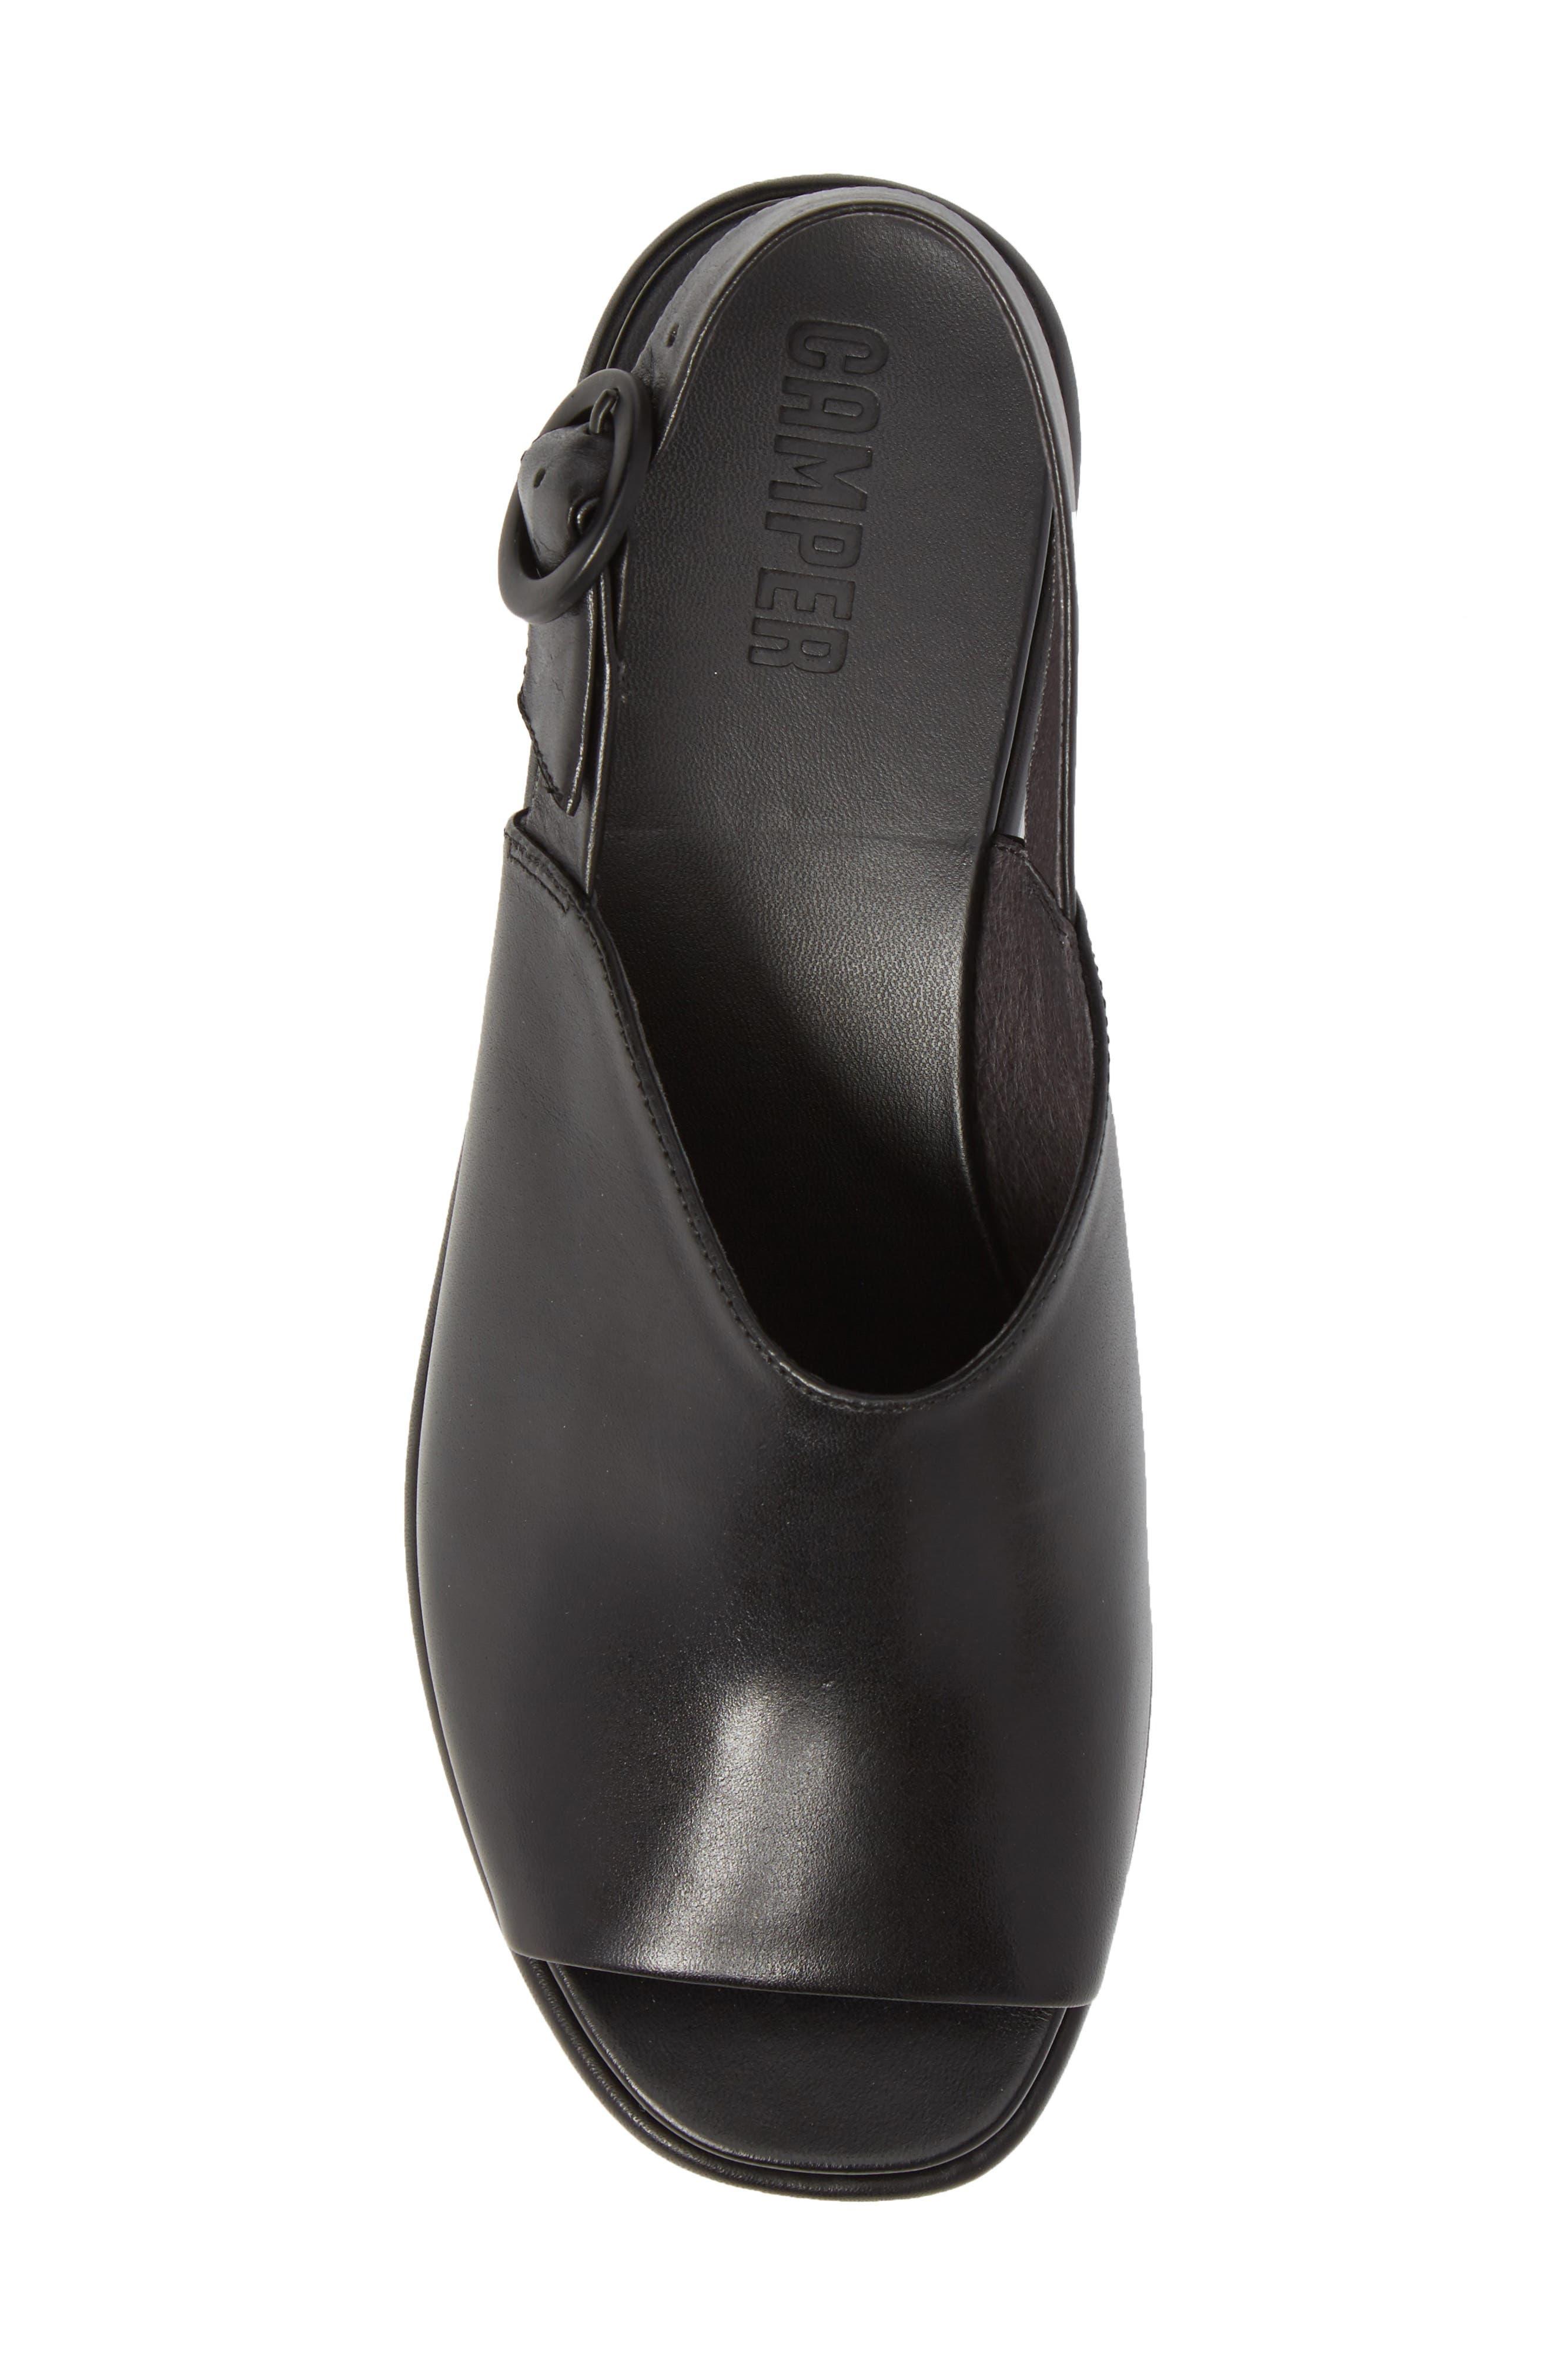 Misia Slingback Platform Wedge Sandal,                             Alternate thumbnail 5, color,                             Black Leather